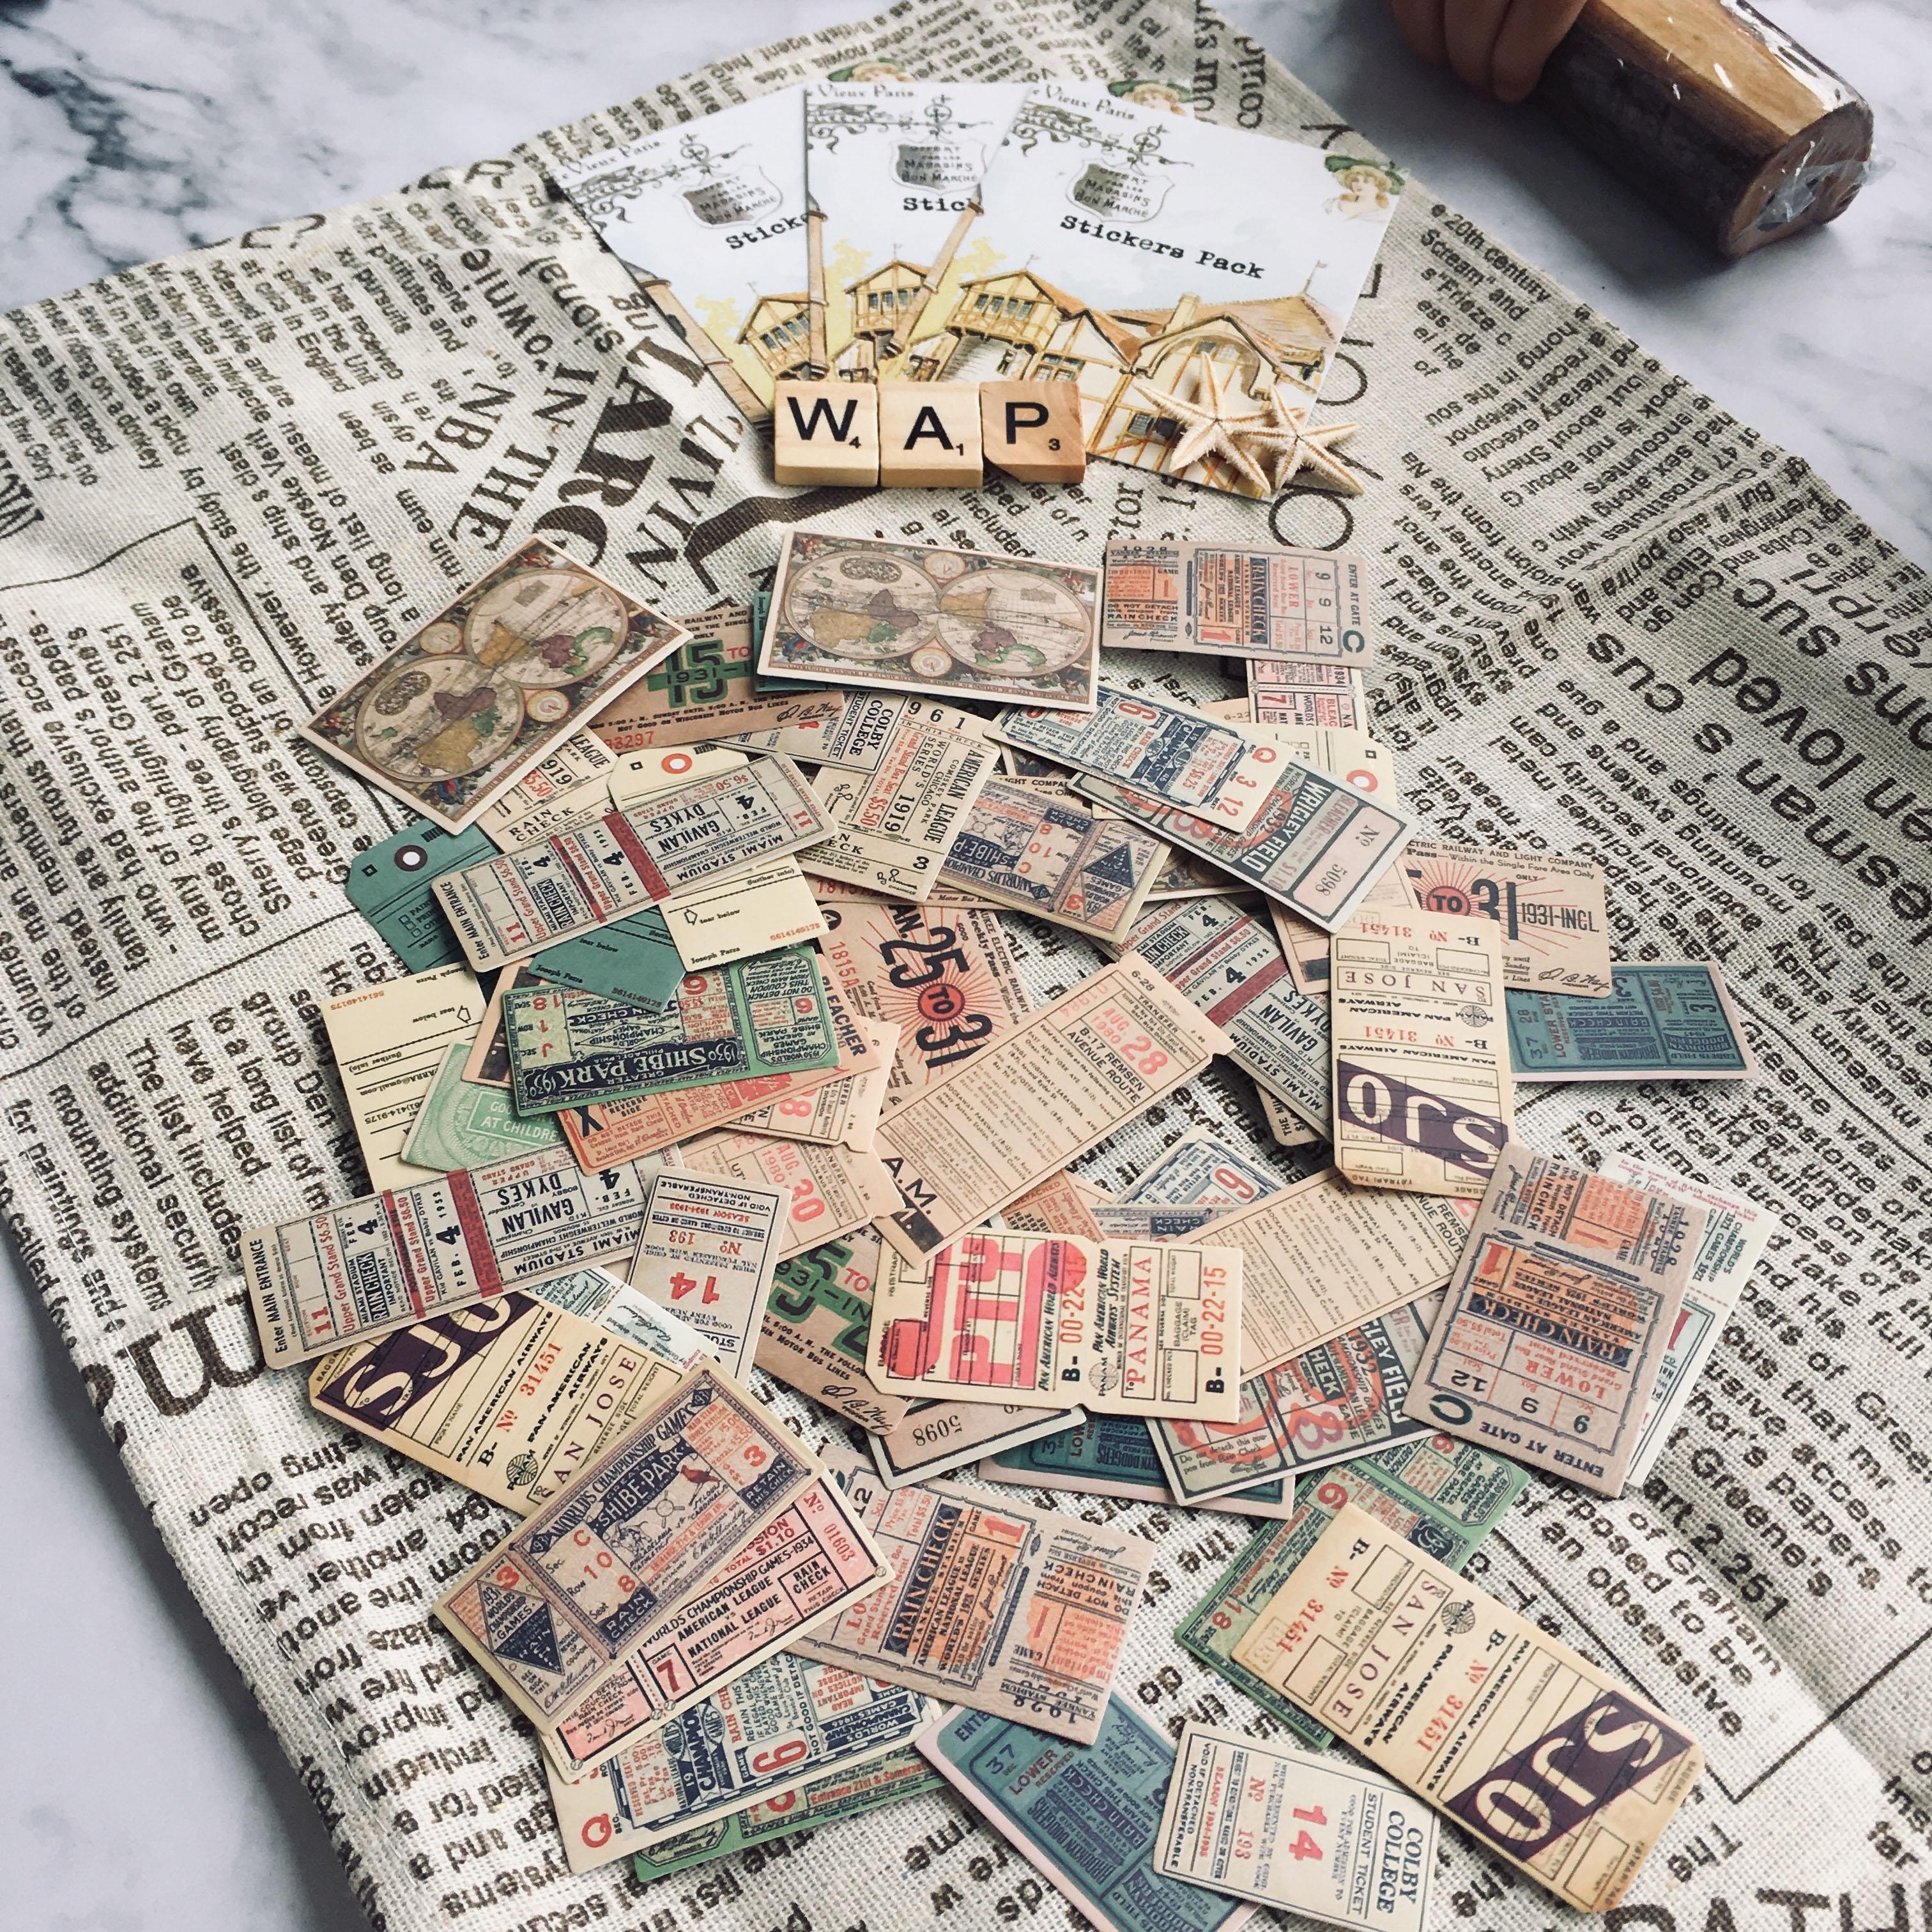 New 2 Pack/lot Tim Holtz Style Vintage Retro Tickets Old Paper Bill Europe Map Decorative Sticker DIY Scrapbooking Planner Album